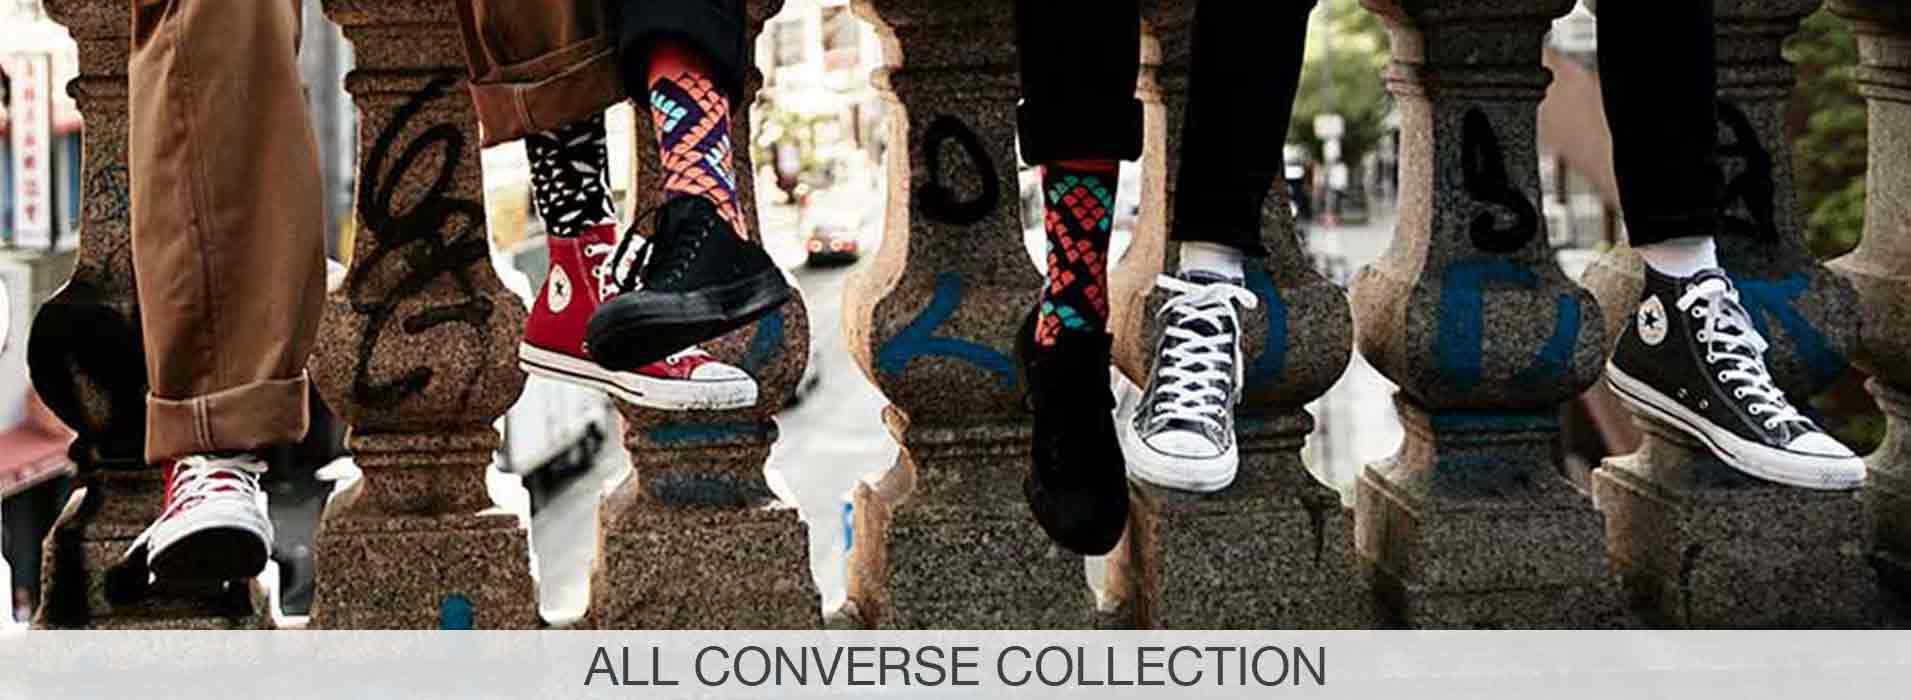 converse shoes 1 utama directory opus program